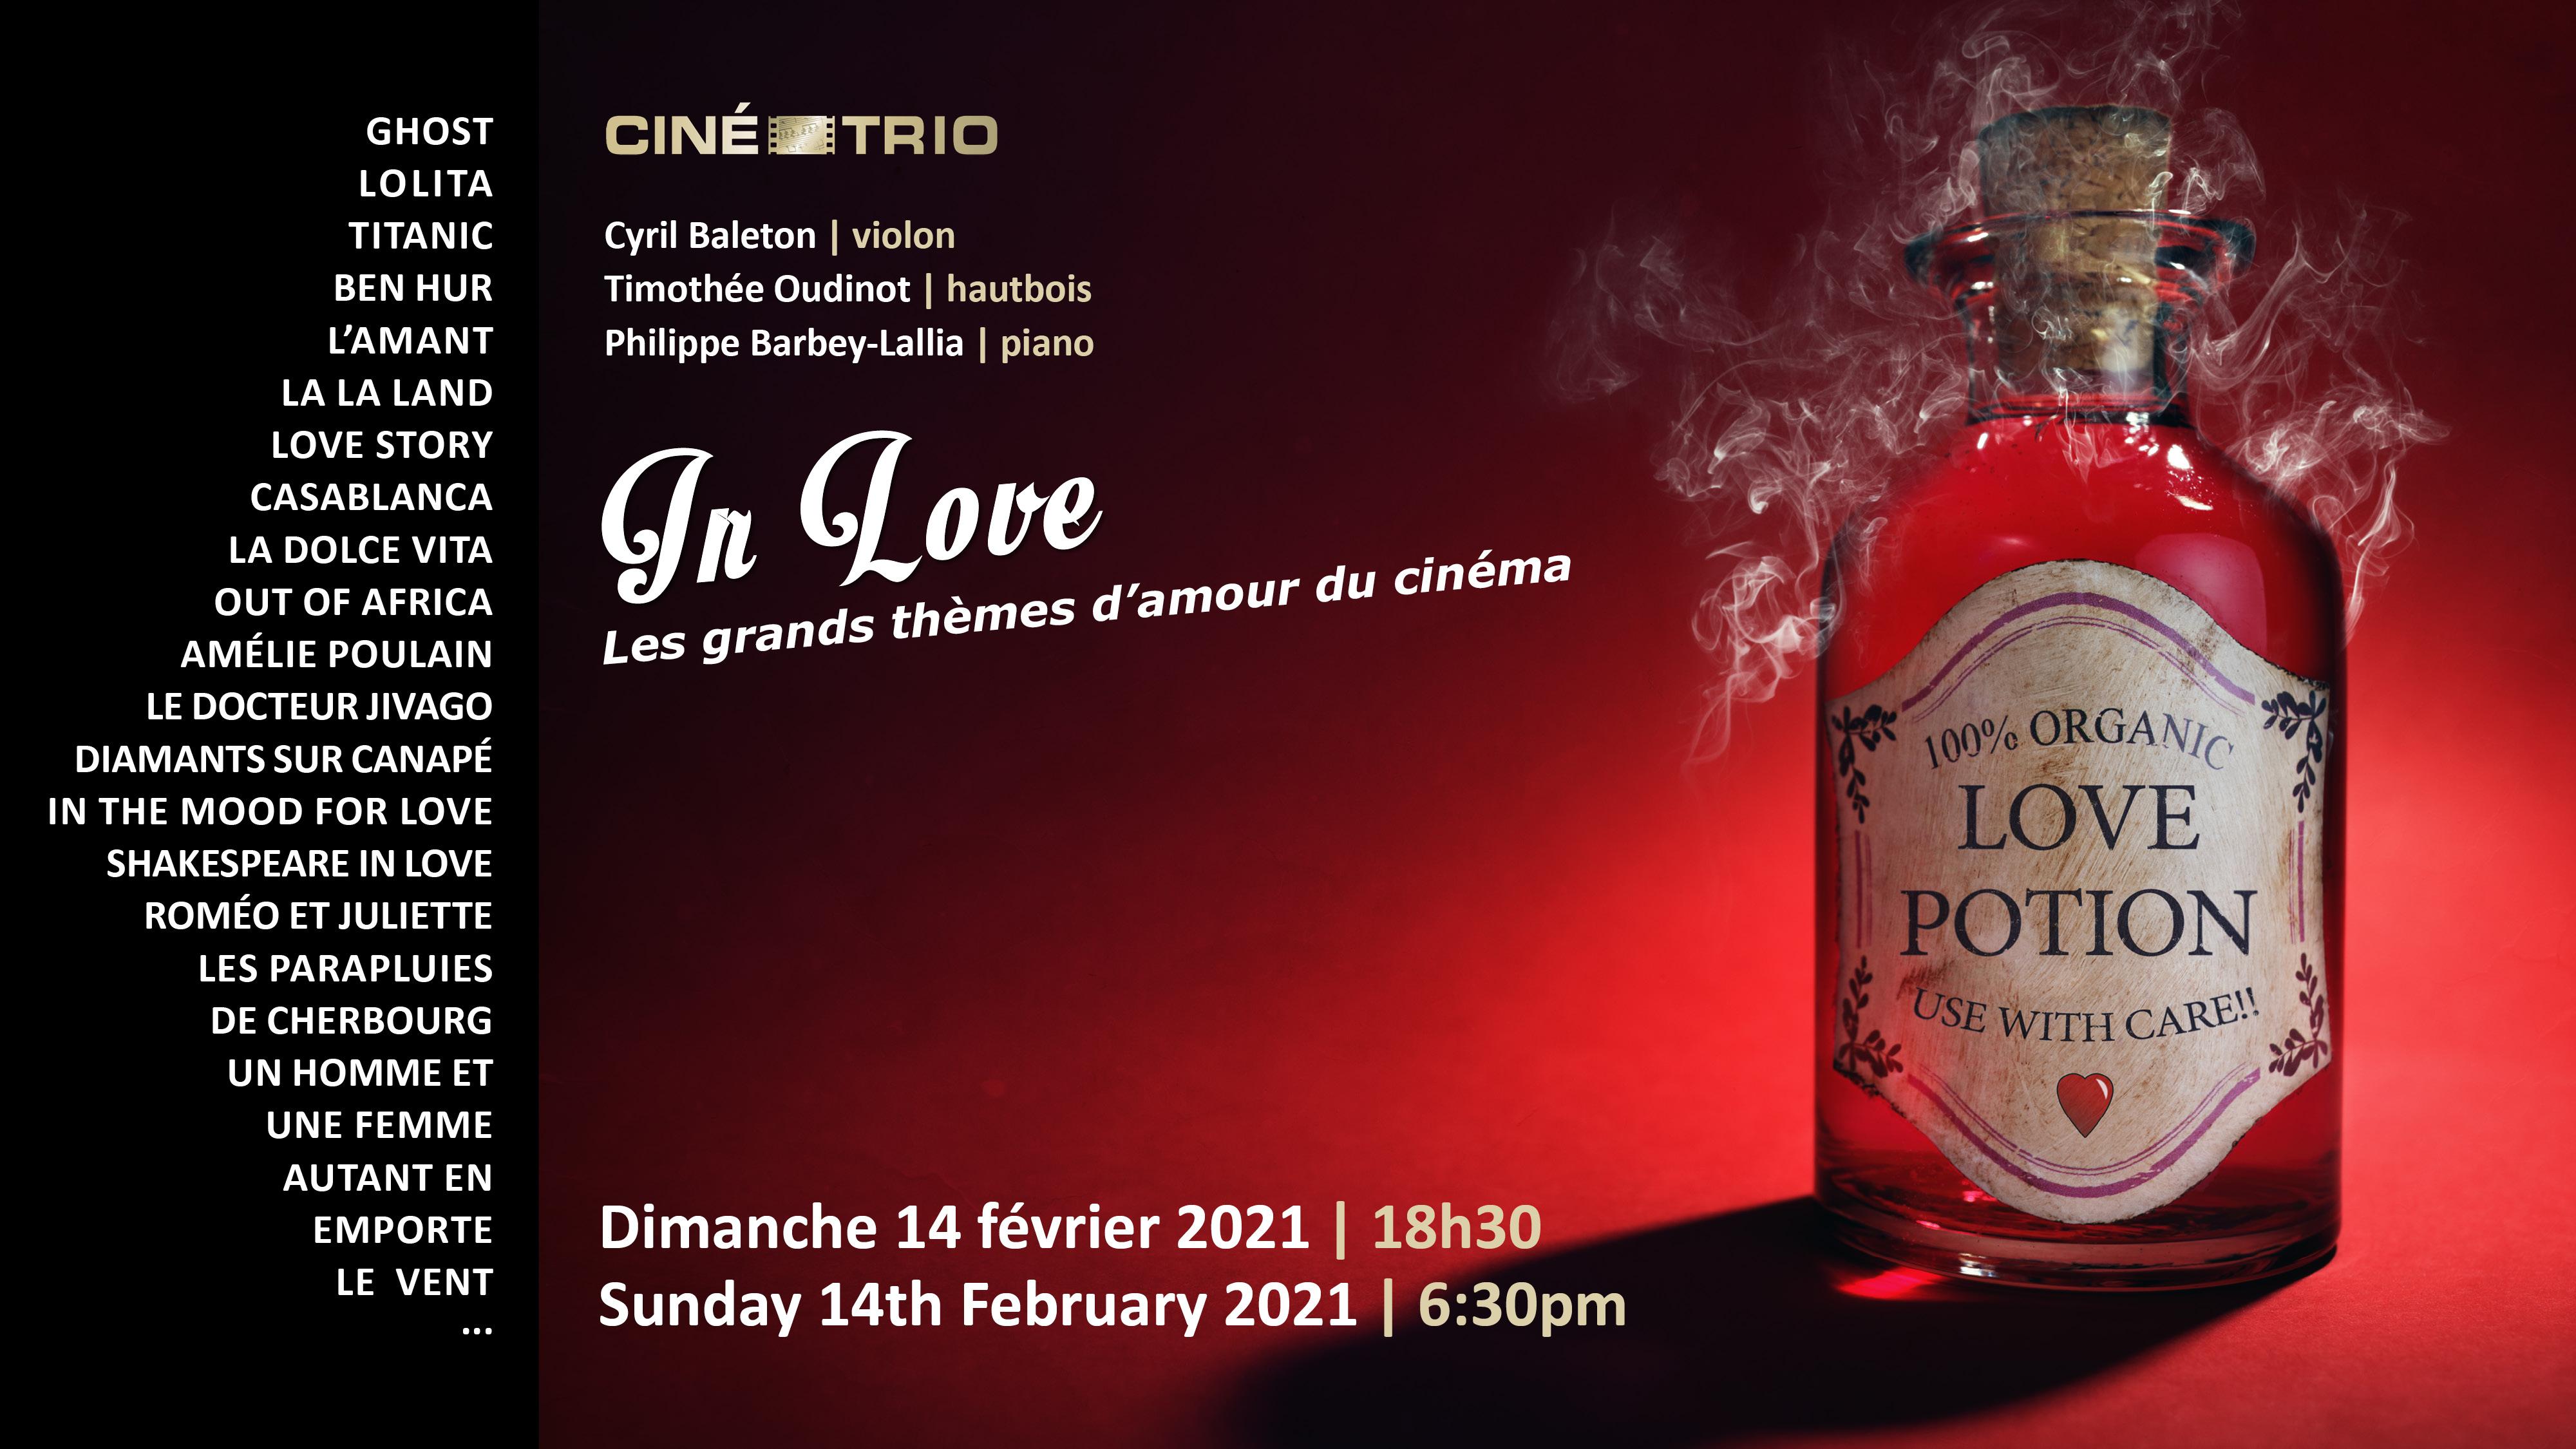 Concert Ciné-Trio en streaming le 14/02 à 18h30 (recithall.com)